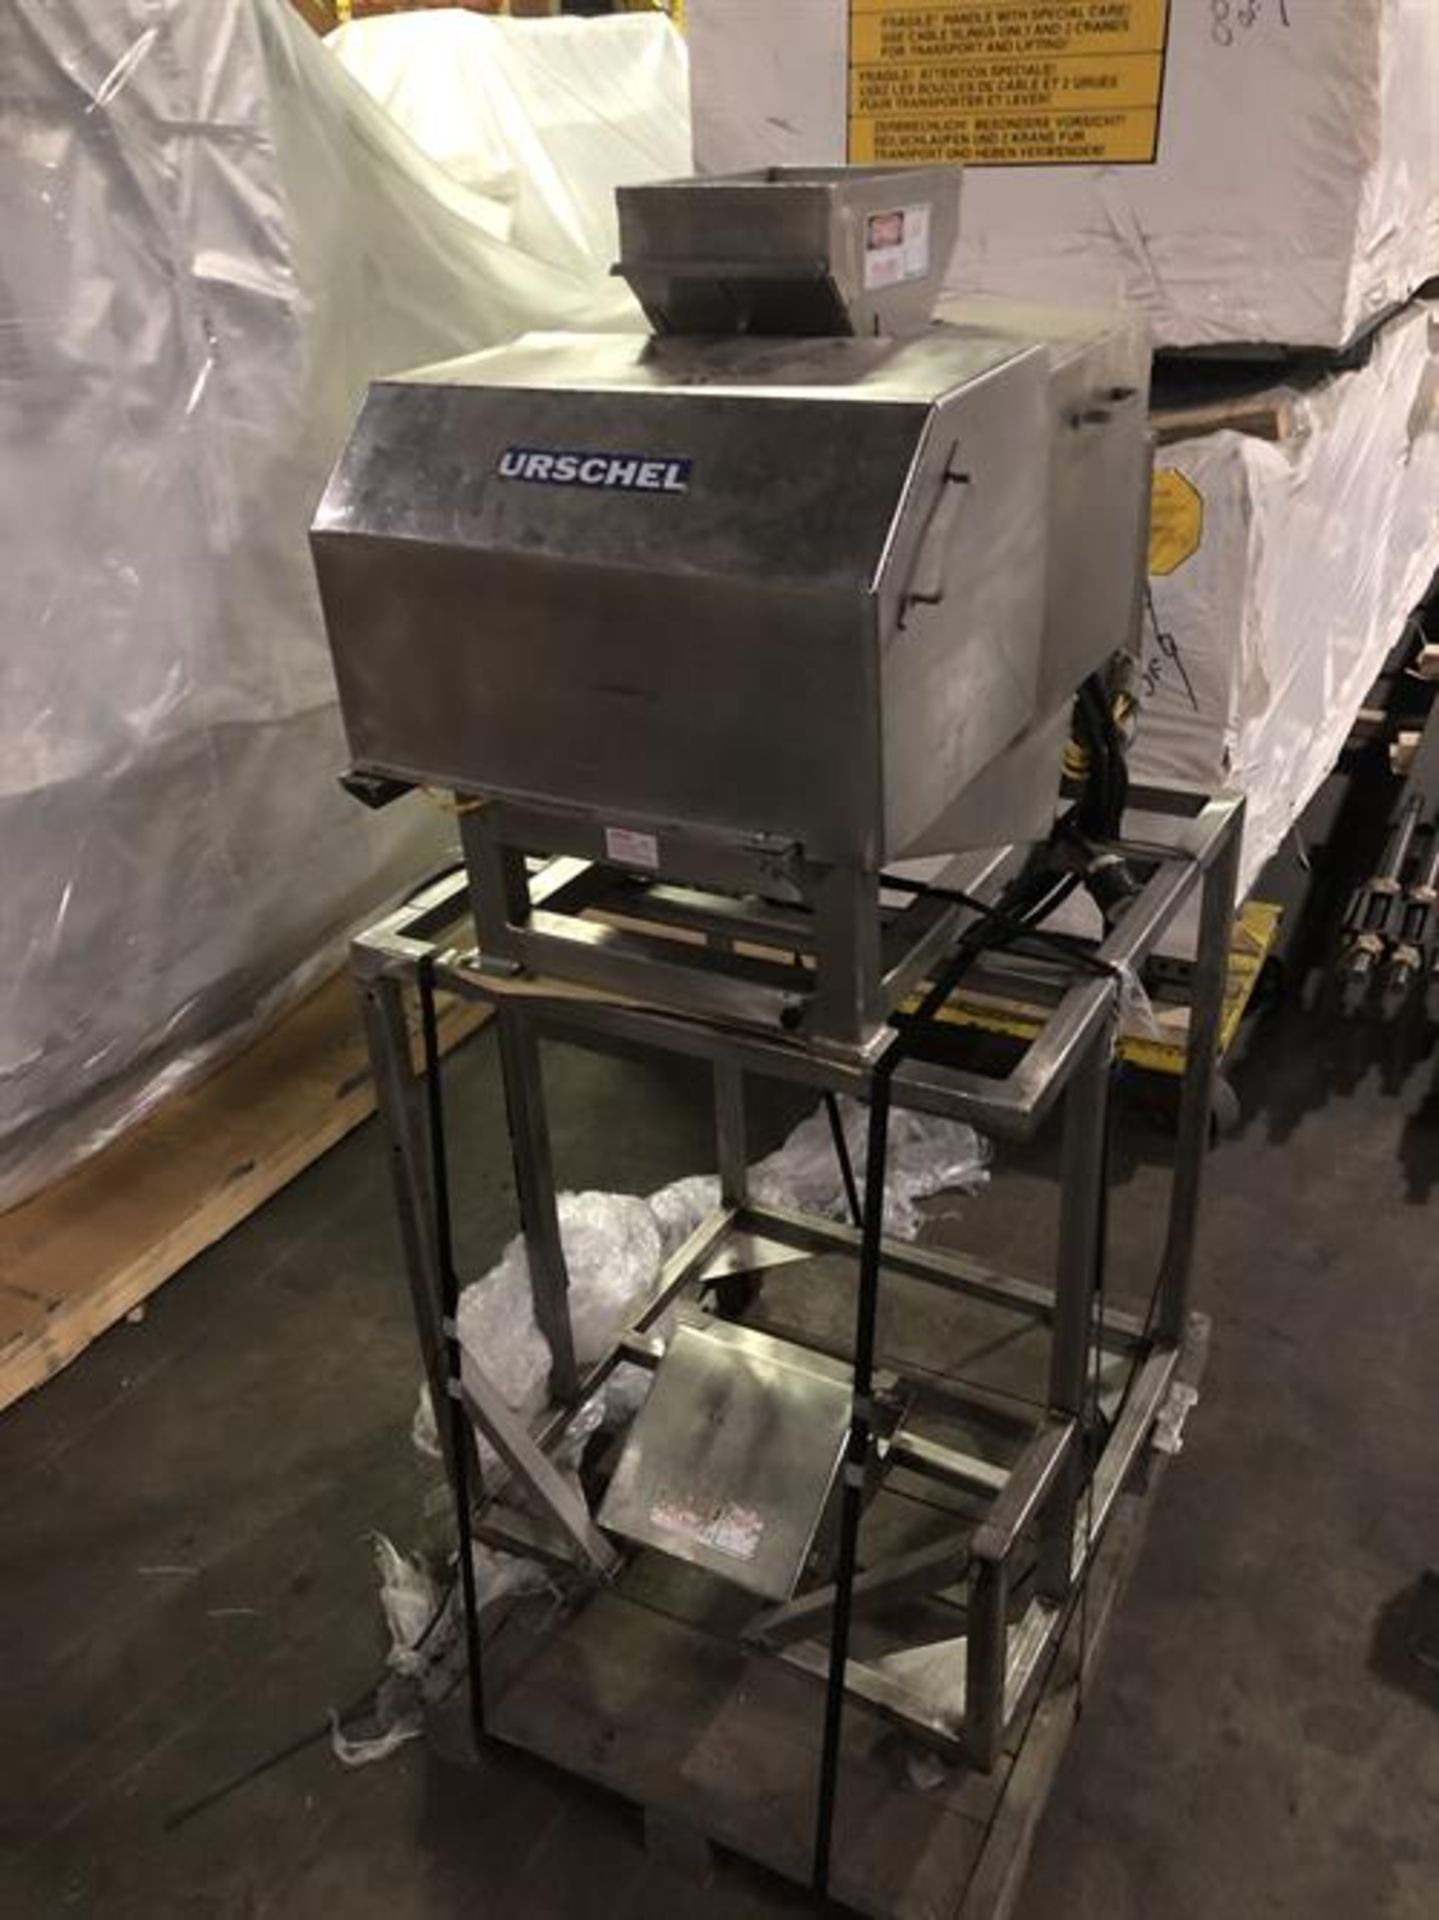 Urschel model N Stainless Steel Granulator - Vibrator pan feeder with variable speed rheostat -